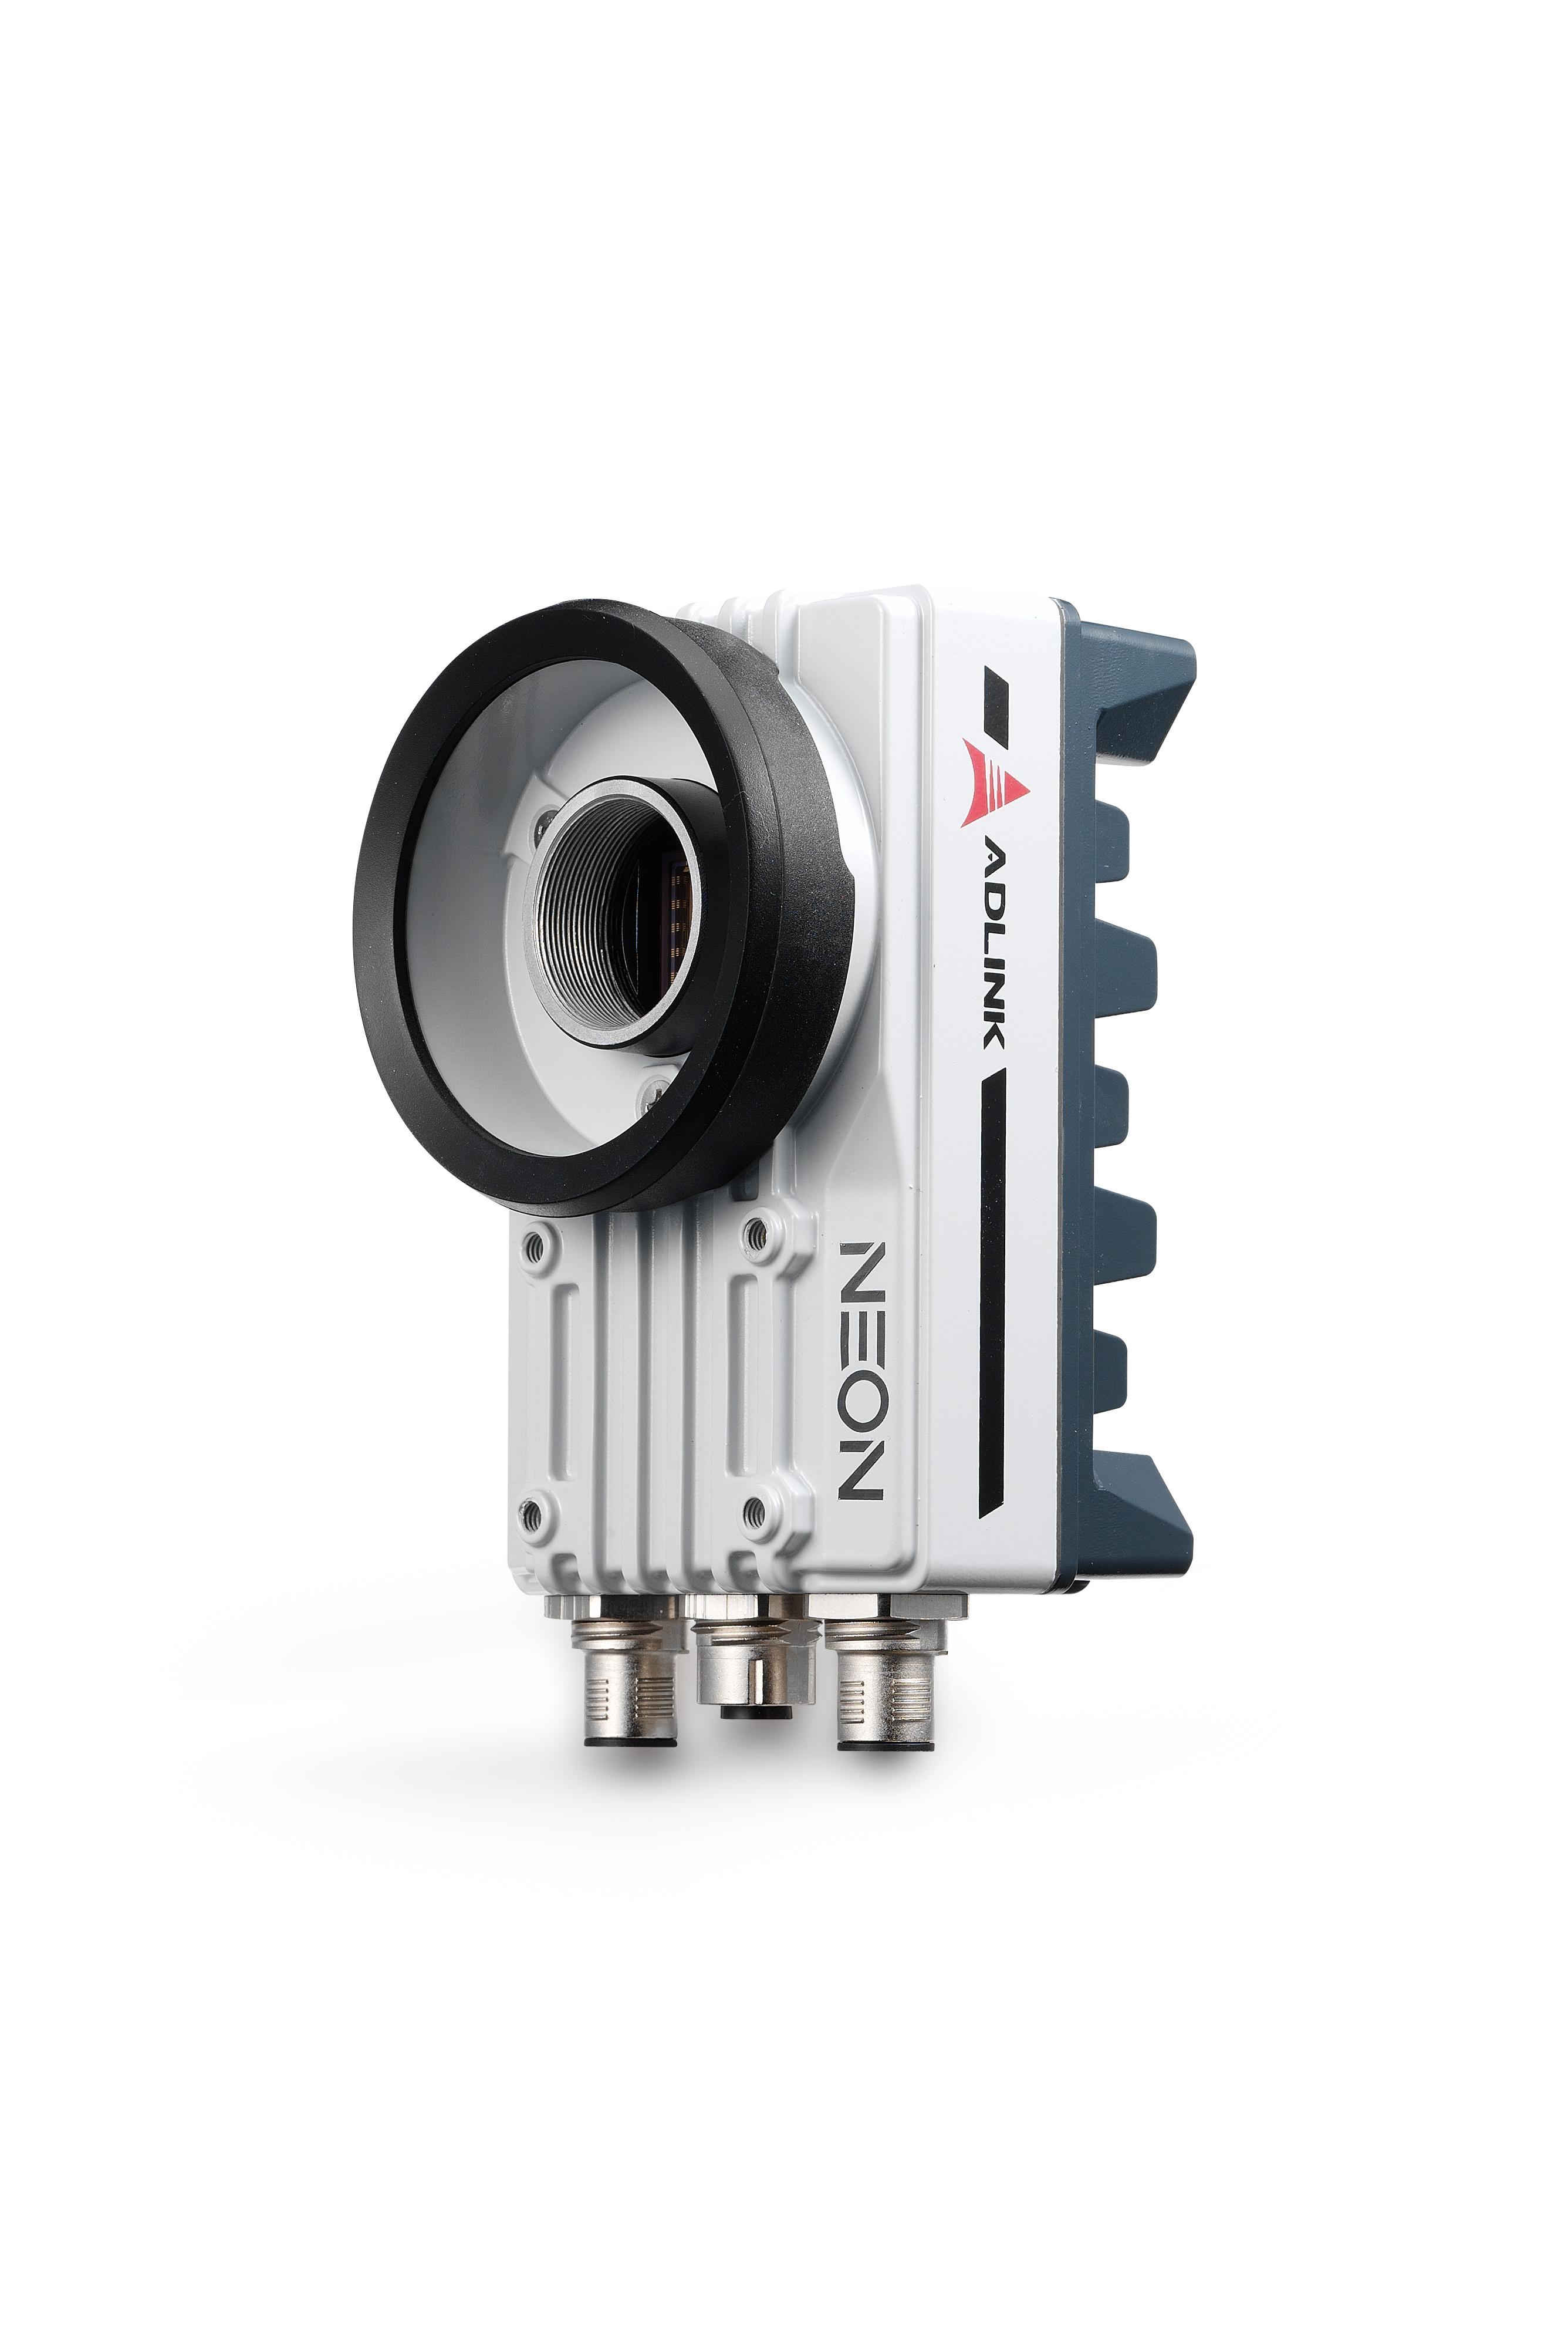 Adlink NEON-1021-M/M4G/SSD32G/64bits WS7E